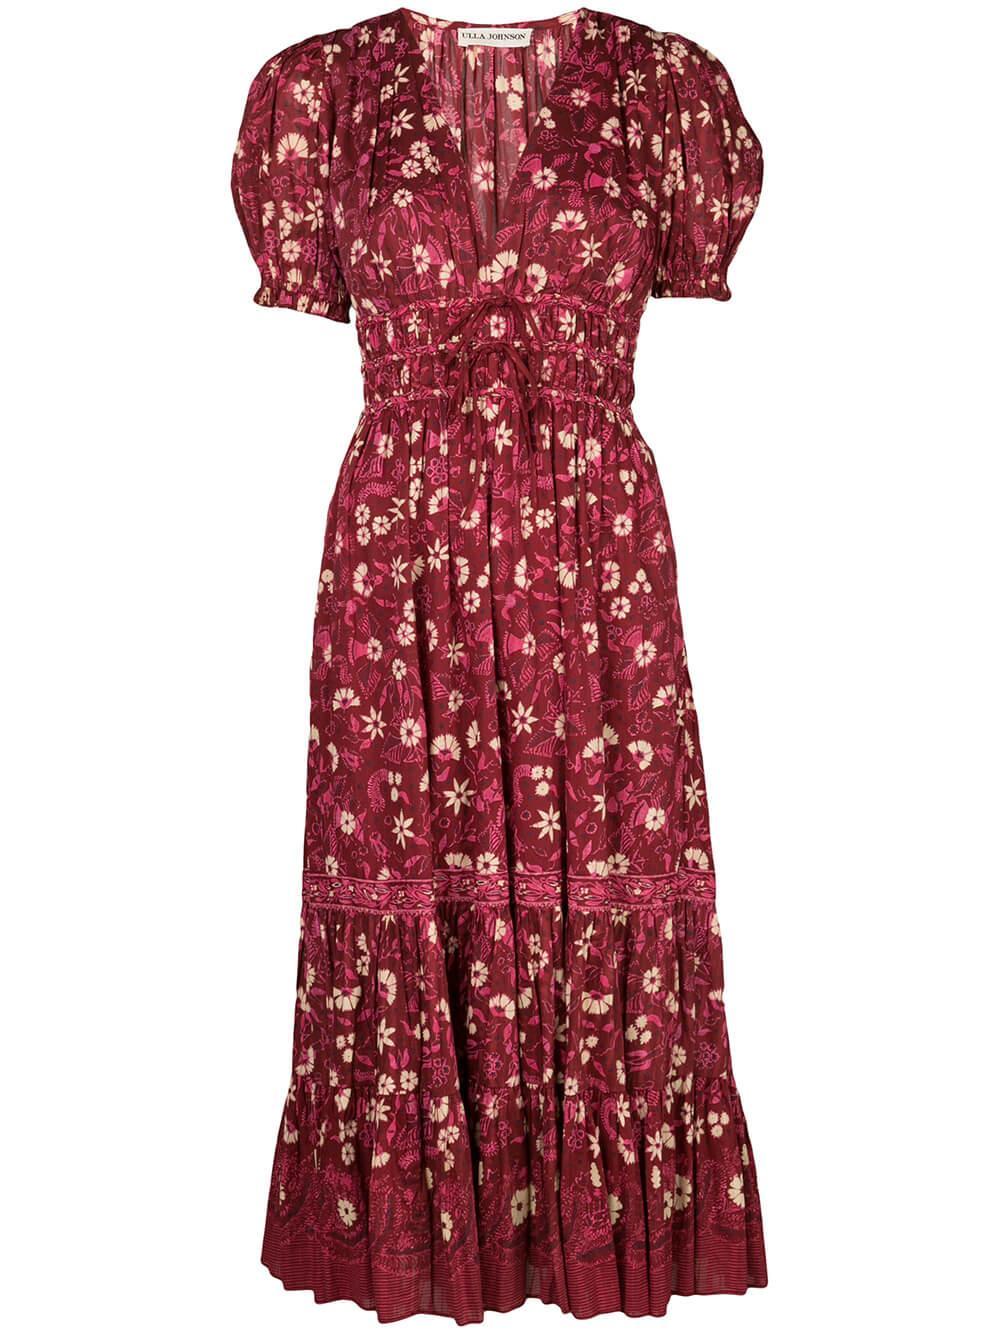 Zaria Midi Short Sleeve Dress